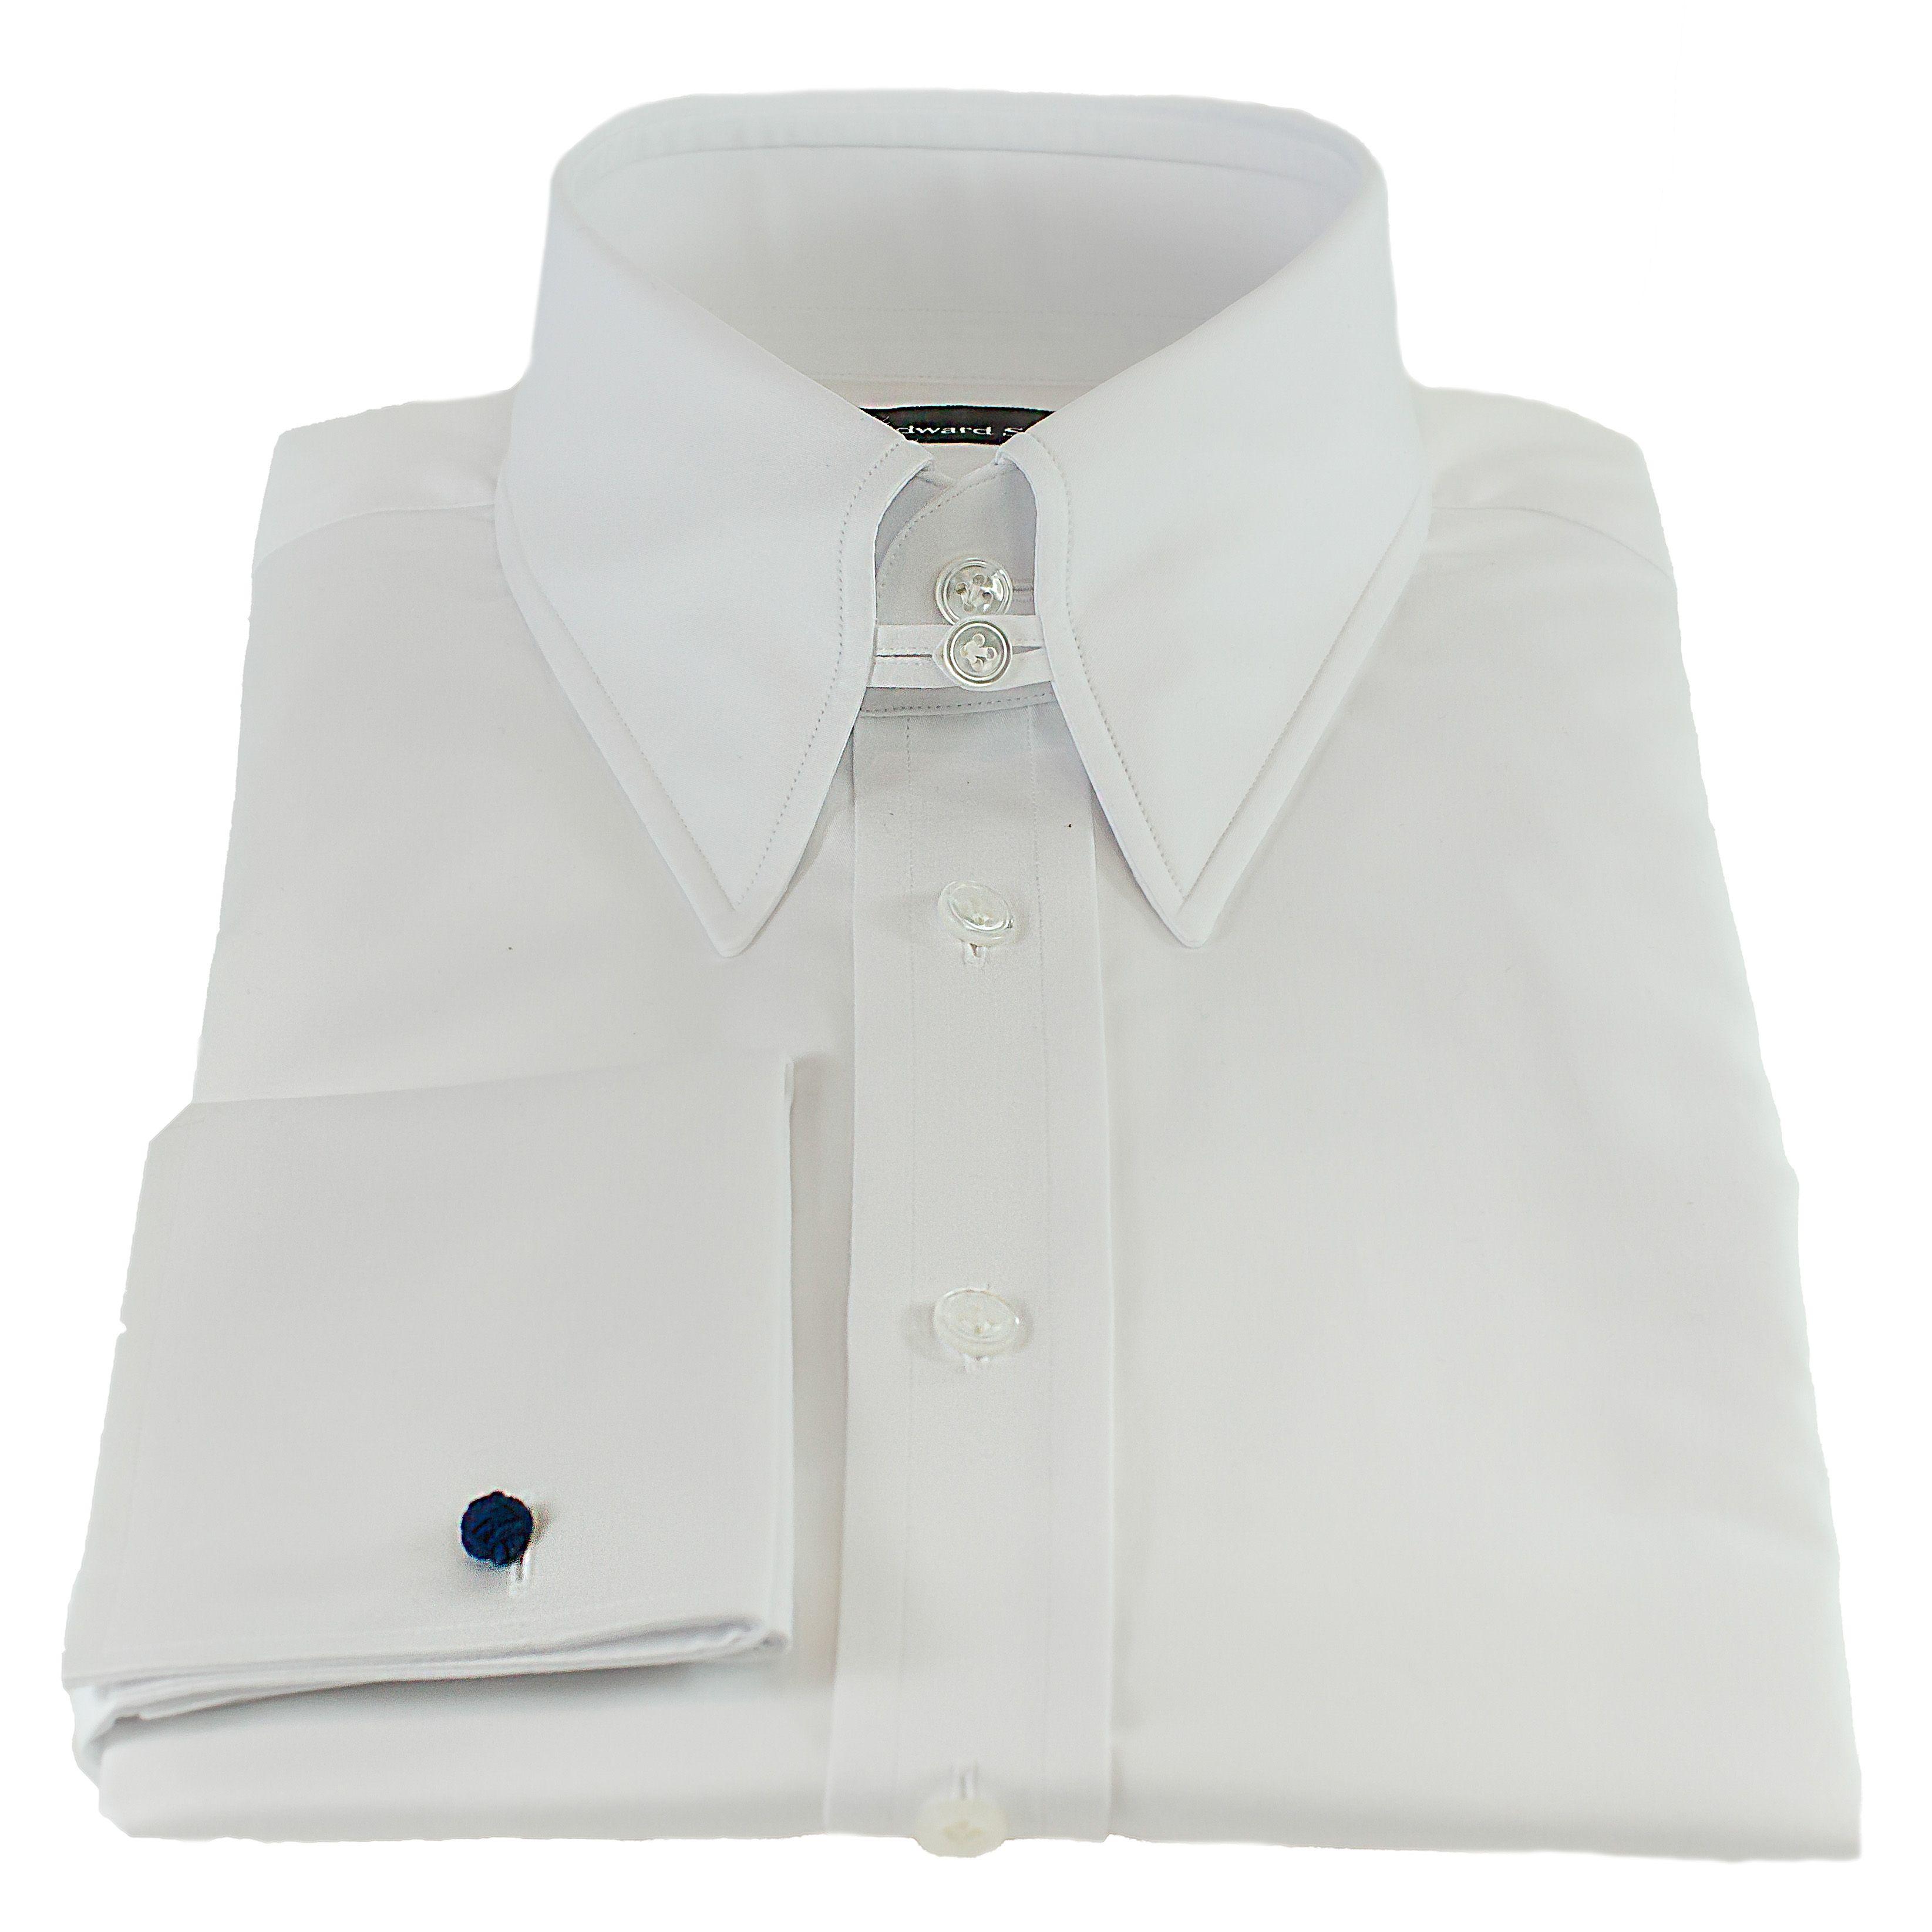 Mens White Dress Shirts Tab Collar Bcd Tofu House